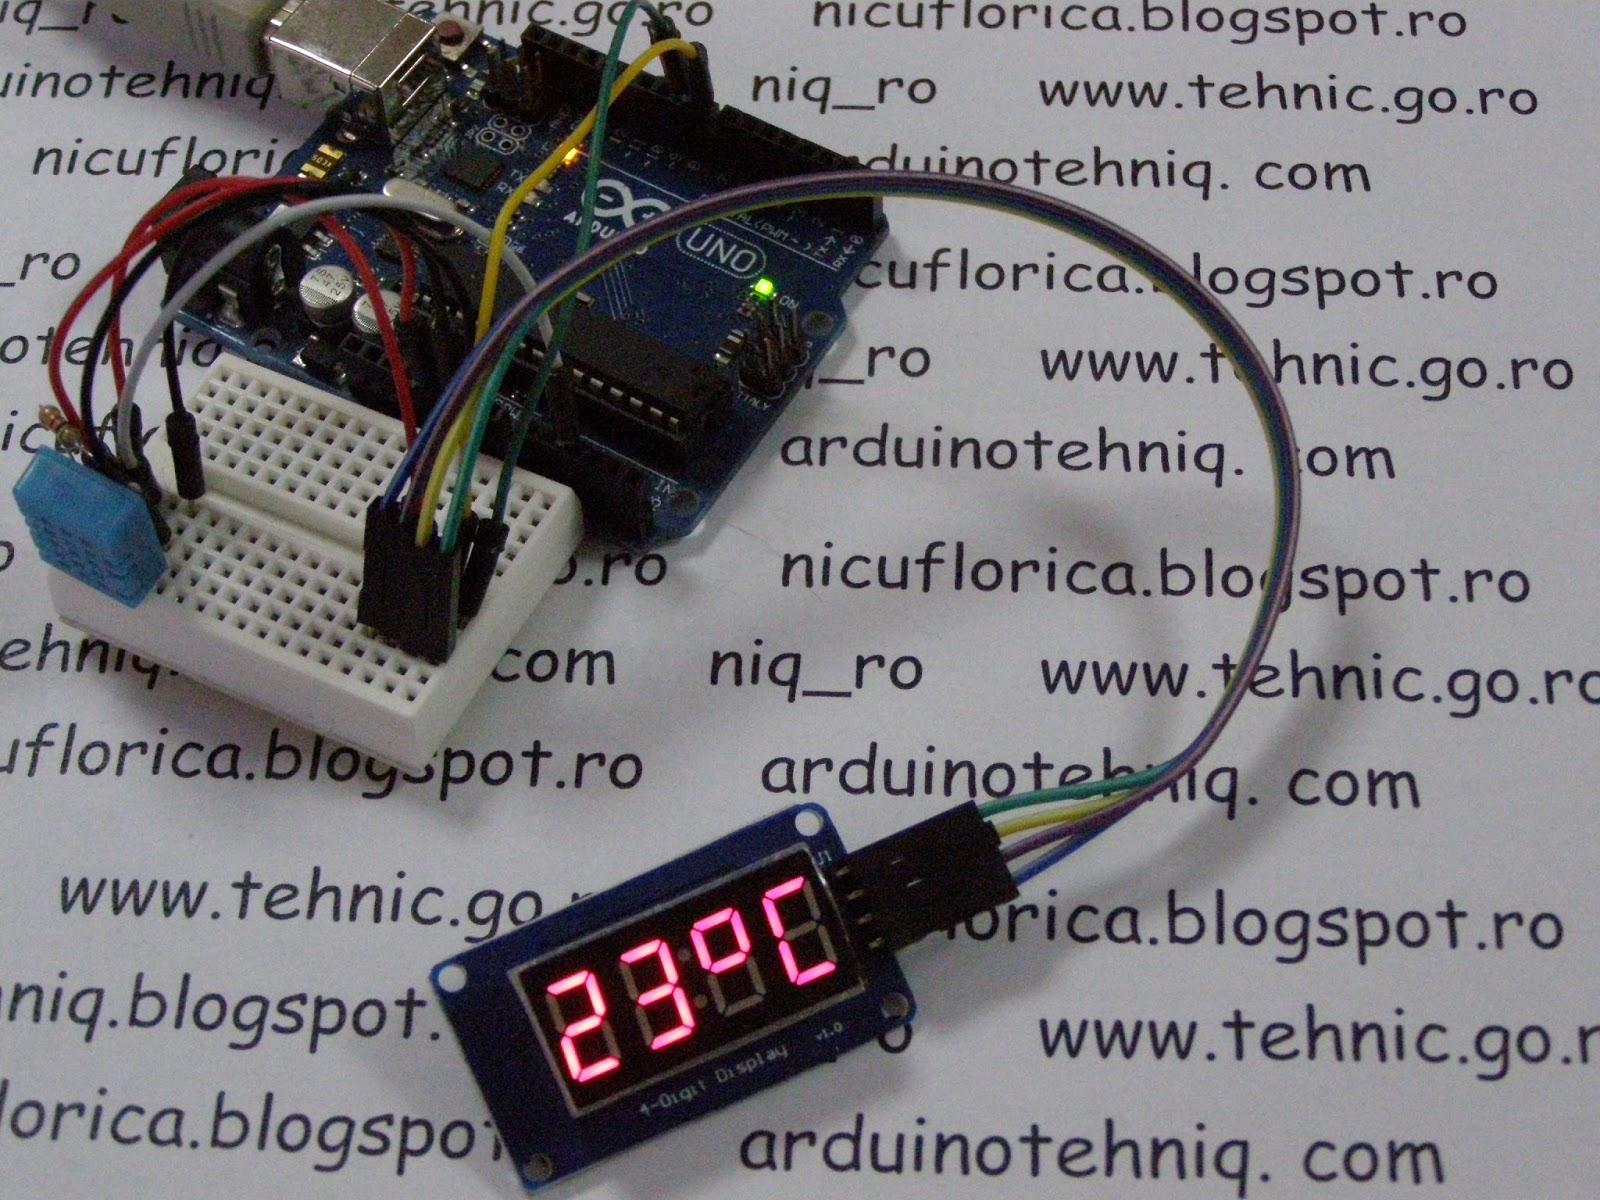 Arduino tehNiq: April 2016